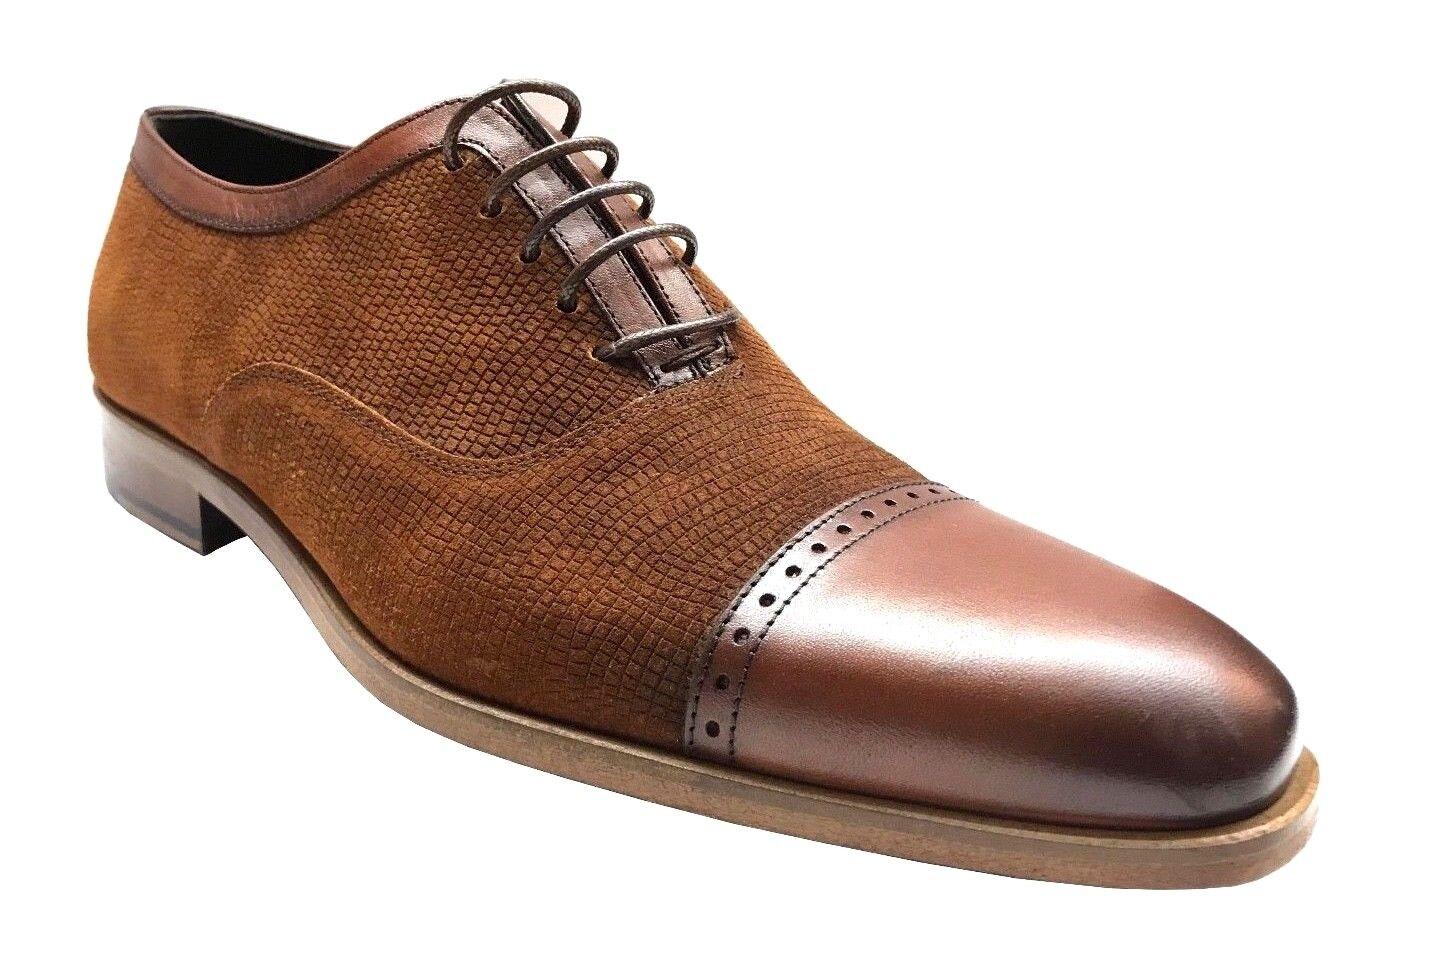 Corrente Men's Cap Toe Leather Suede Oxford Dress scarpe Tobacco 4560